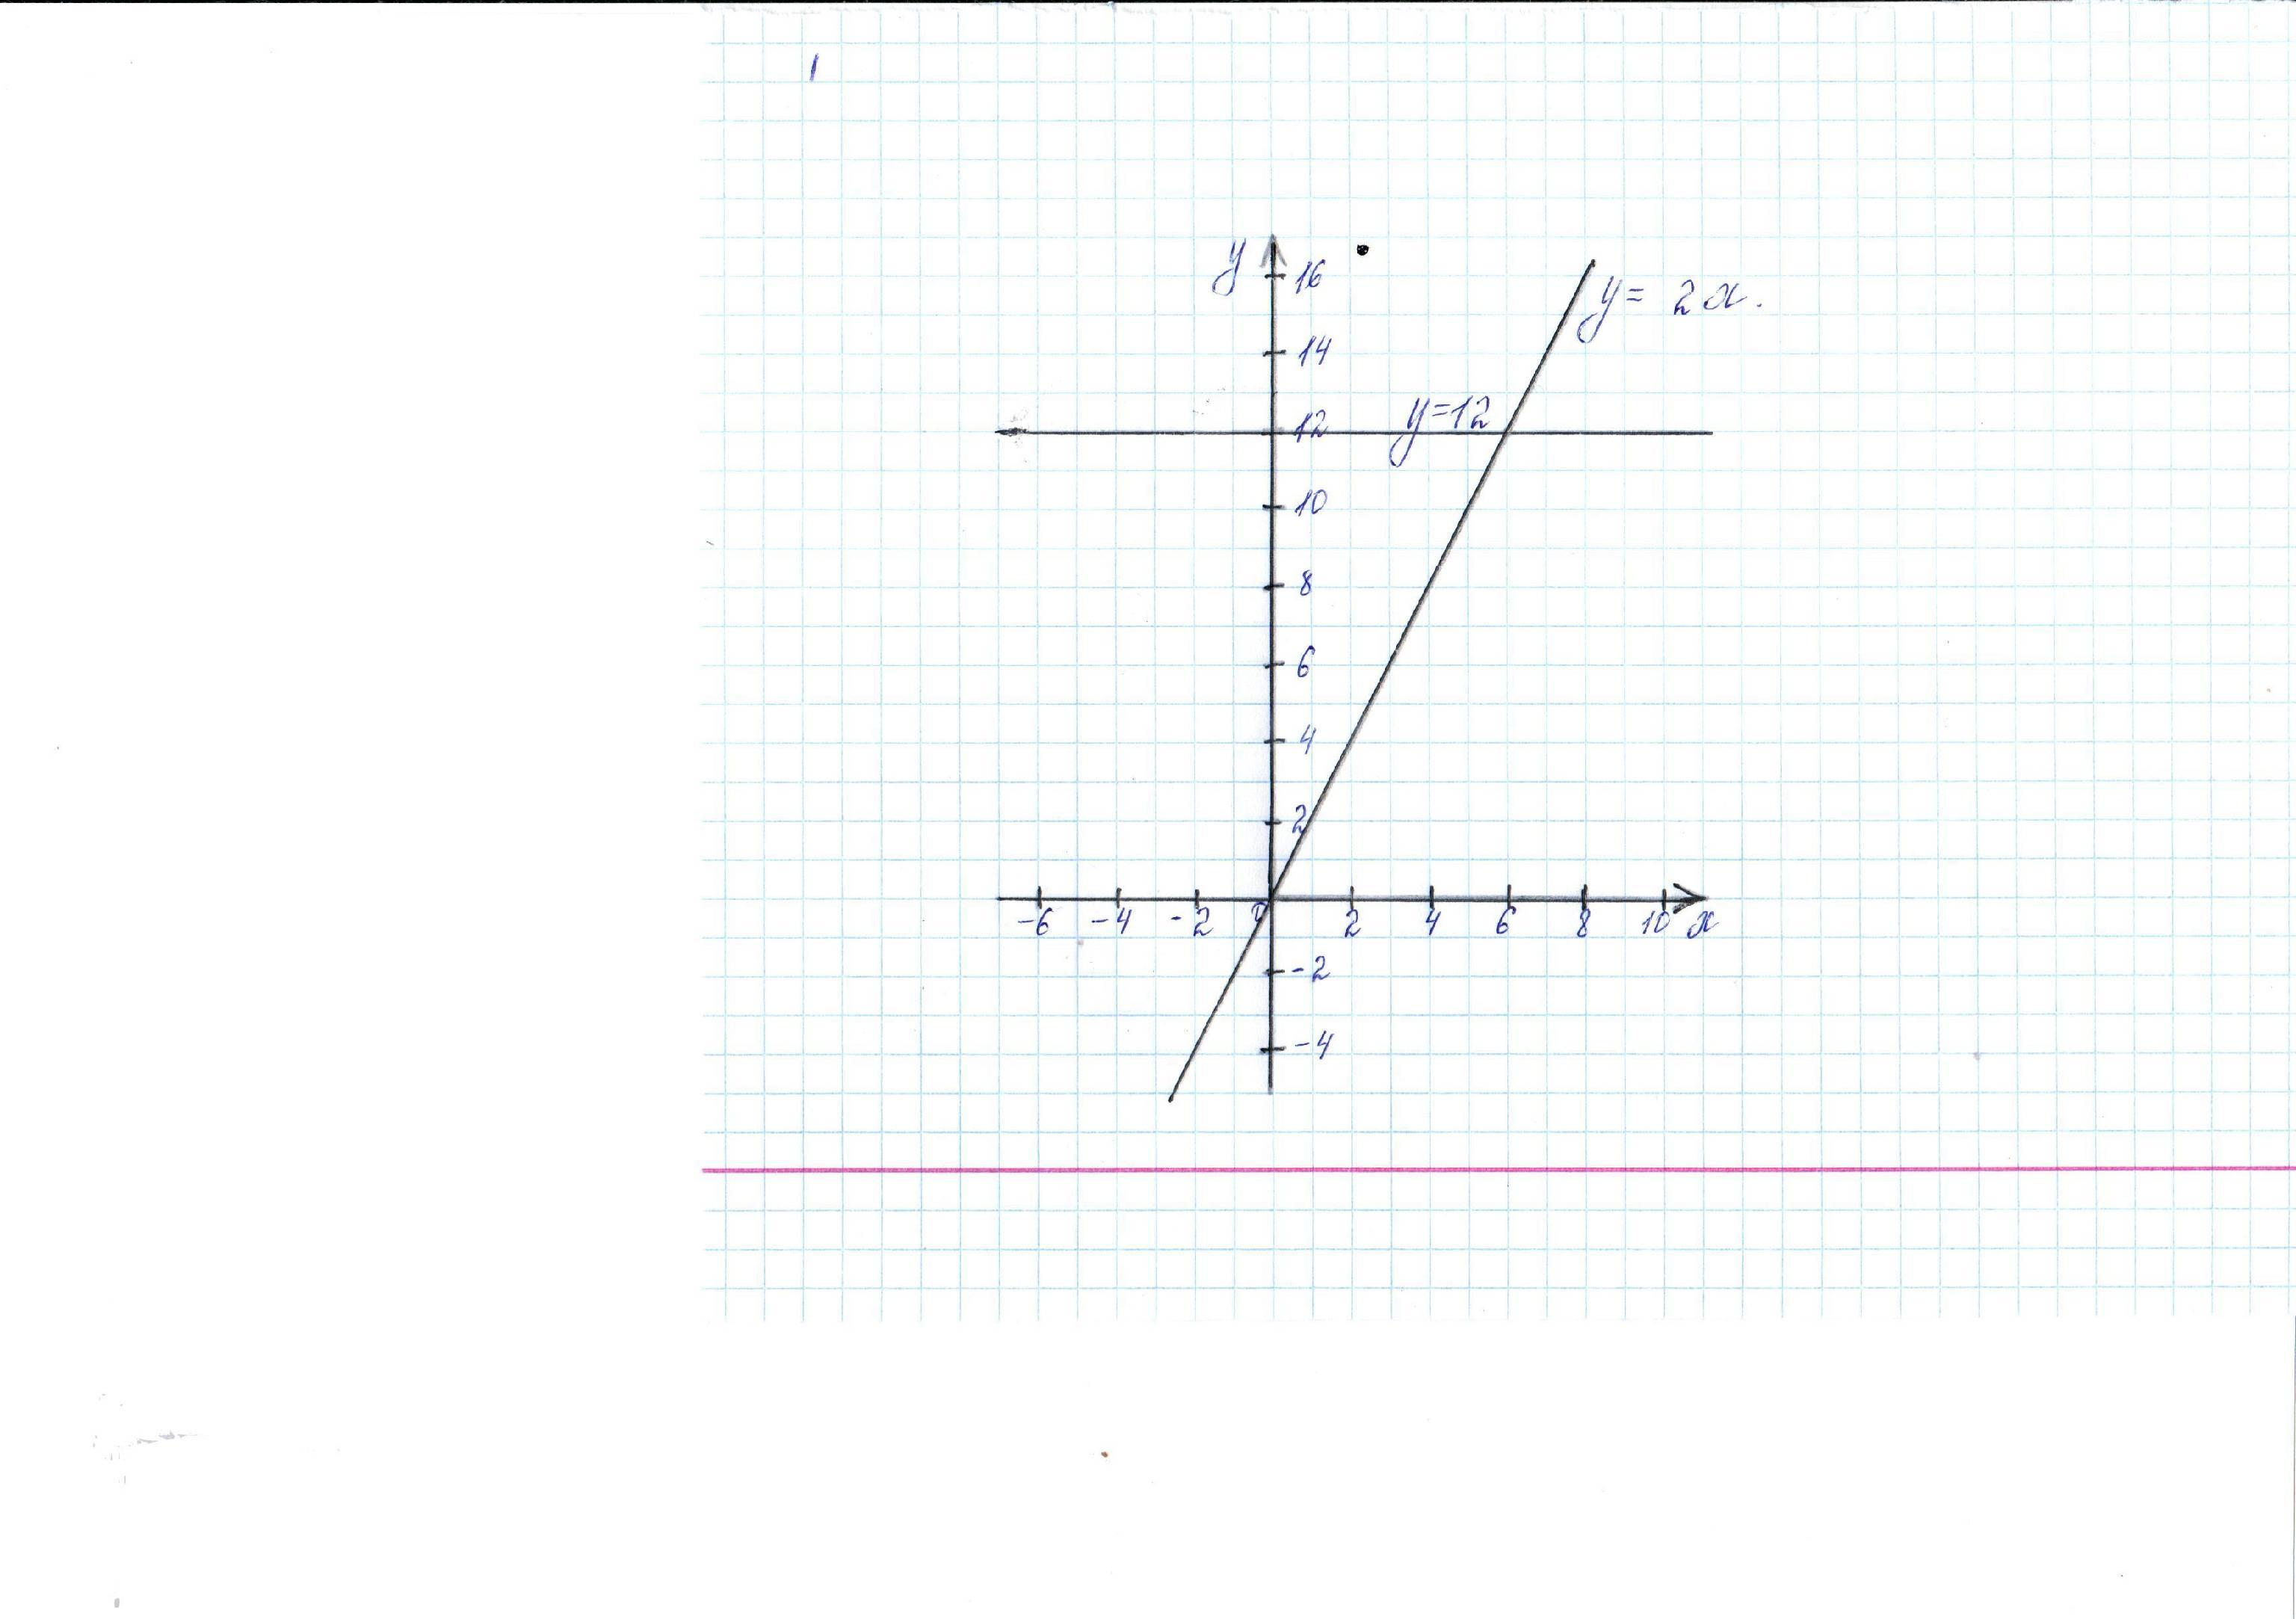 Графический метод решения задач доклад решение задач типа 11 гиа по информатике